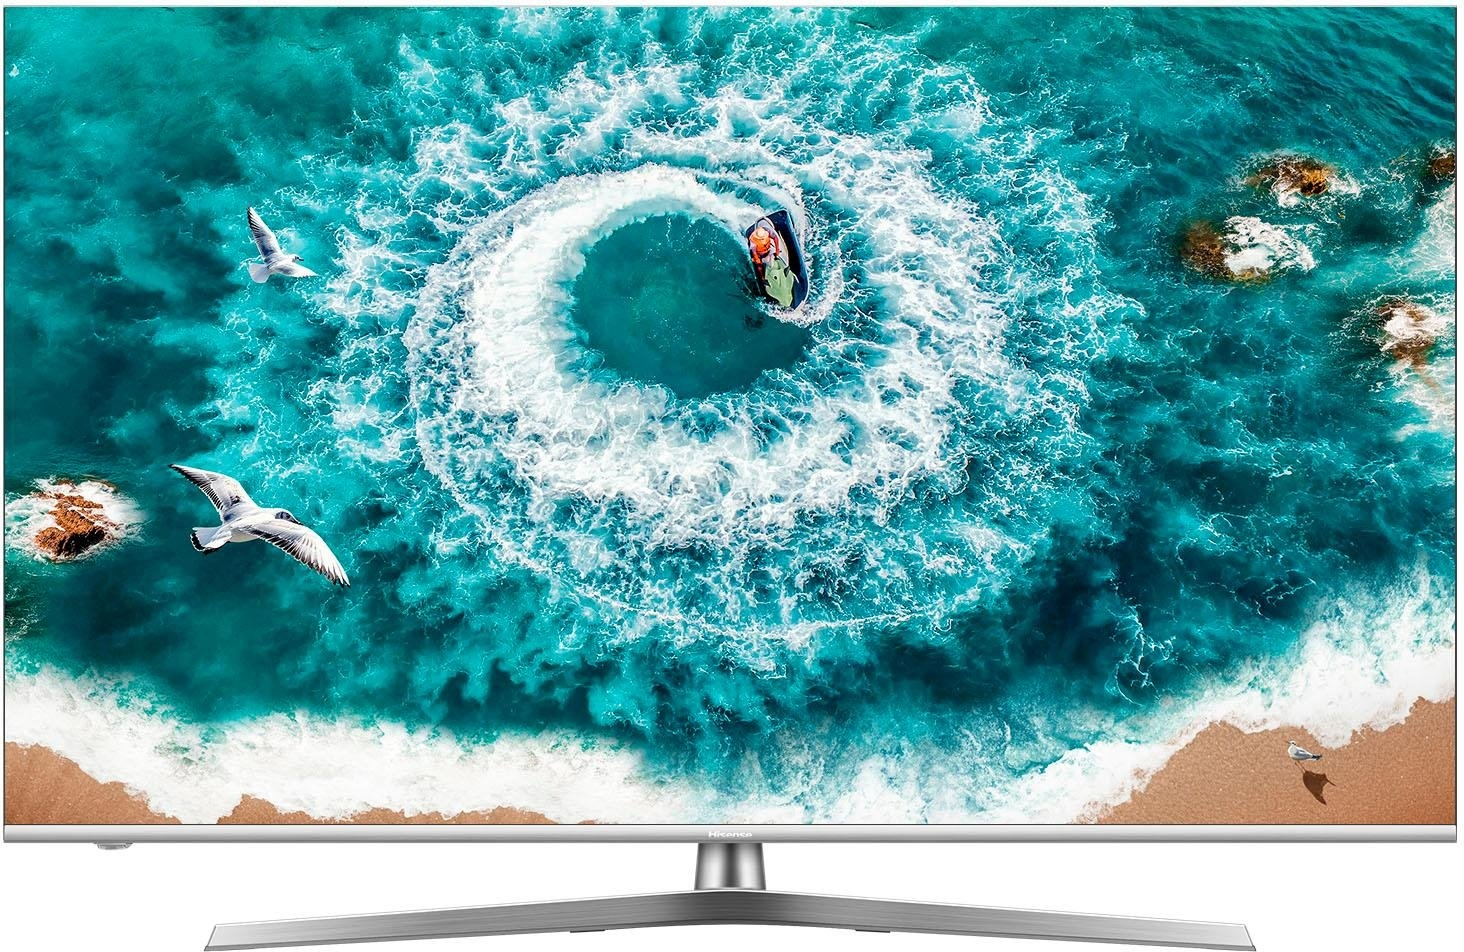 Hisense H55U8B led-tv (138 cm / 55 inch), 4K Ultra HD, smart-tv online kopen op otto.nl